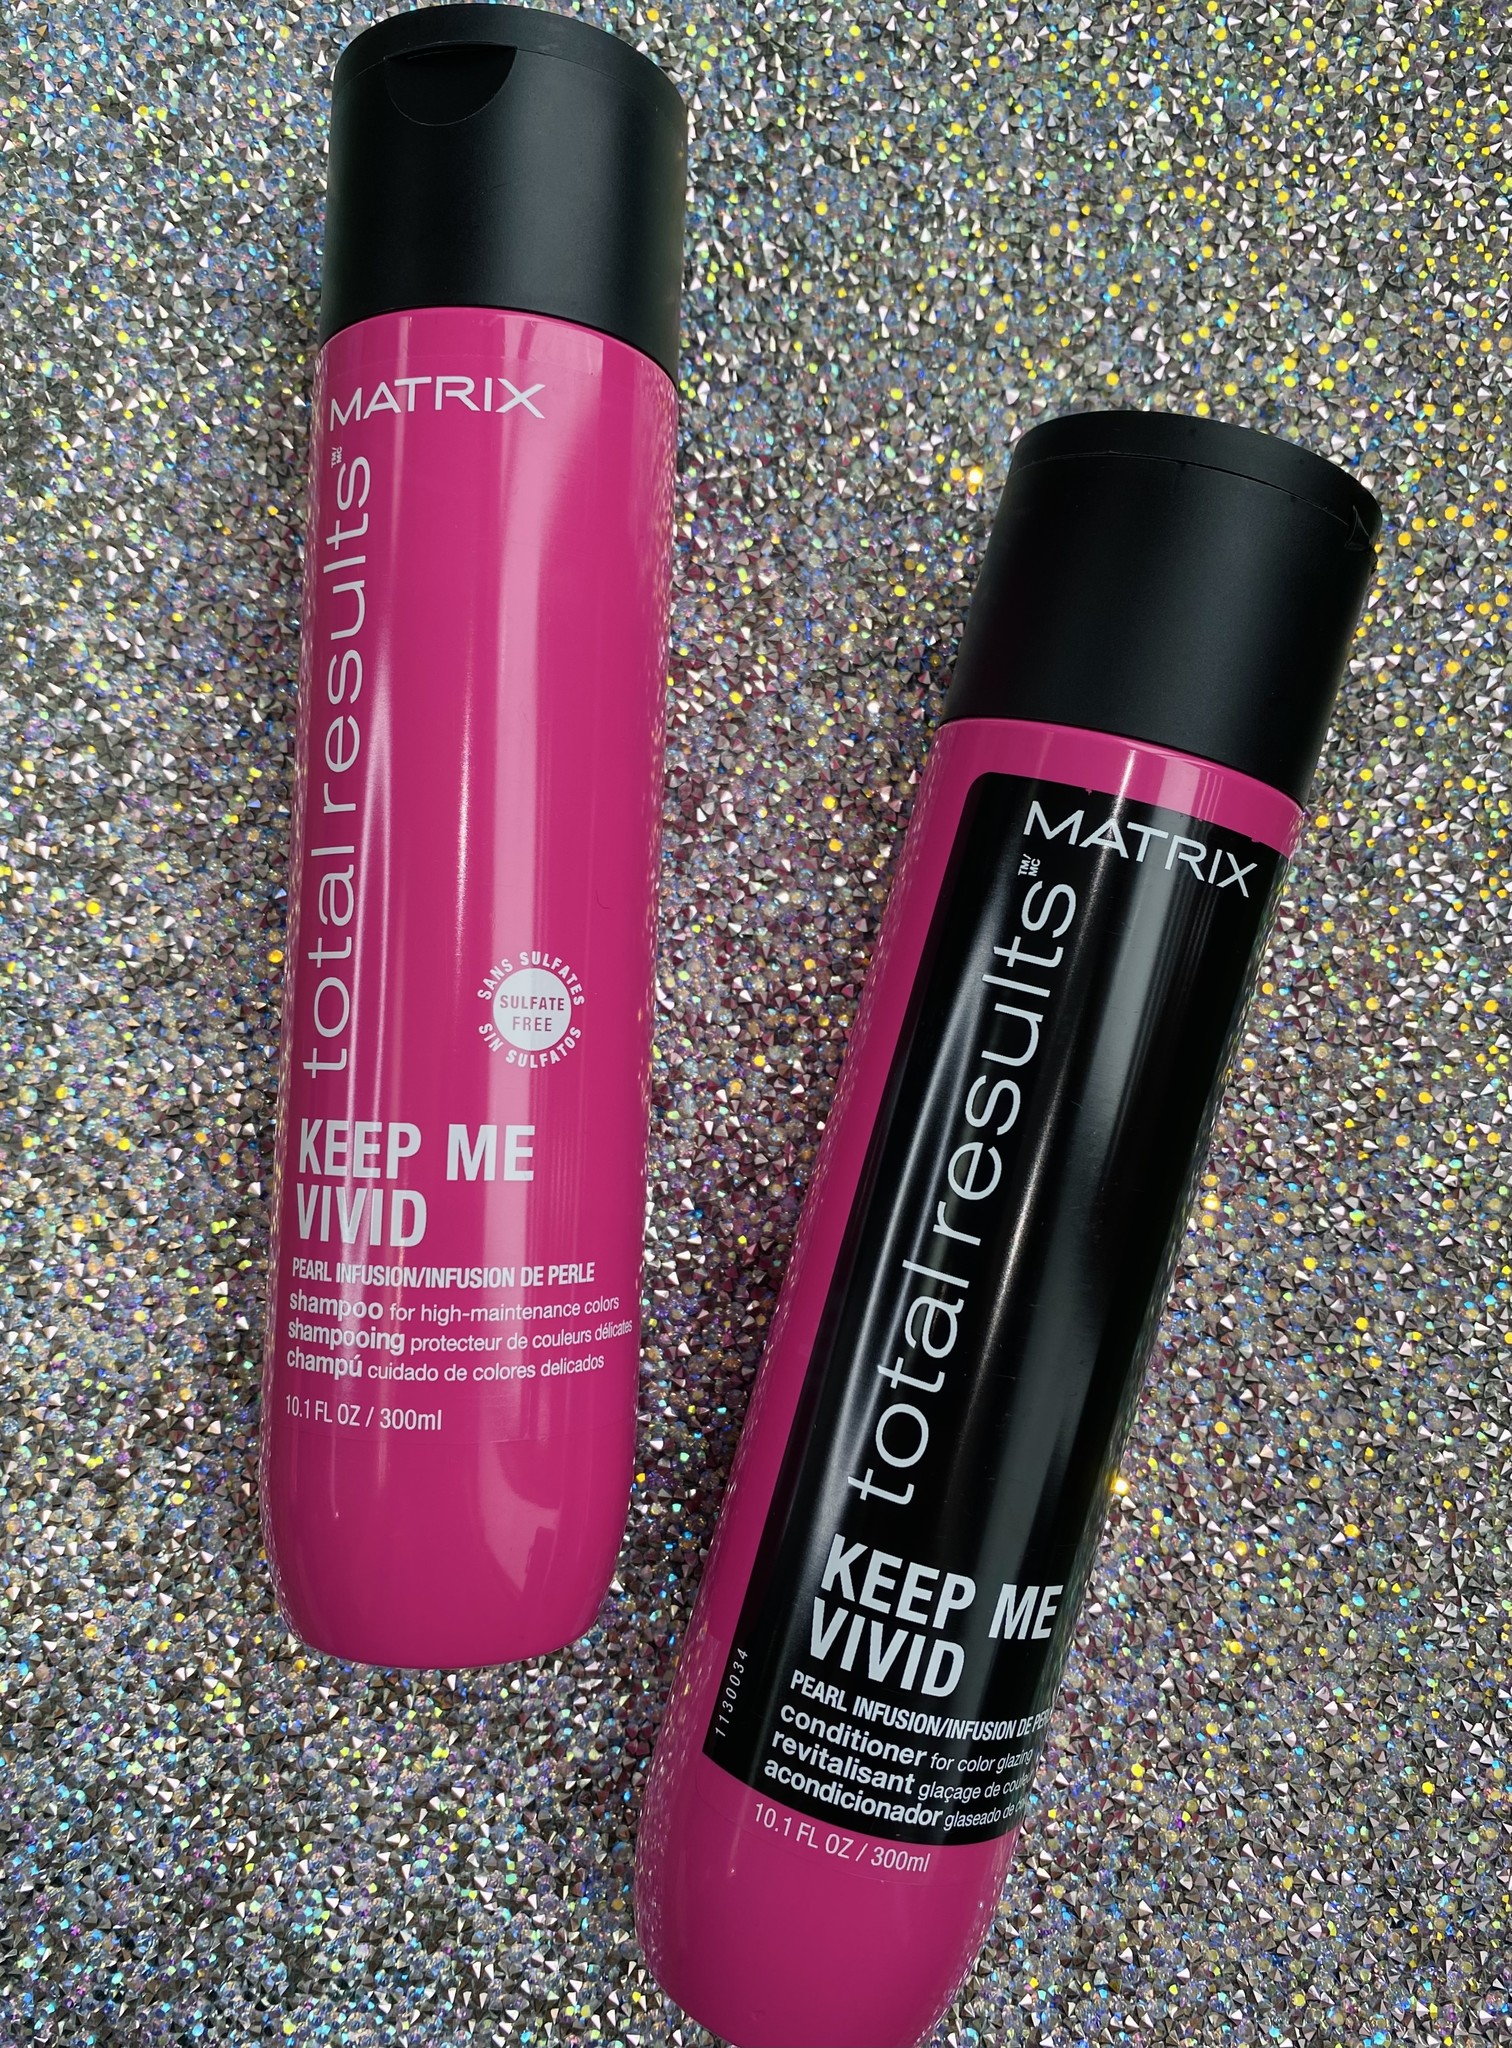 Matrix Keep me vivid shampooing 300ml